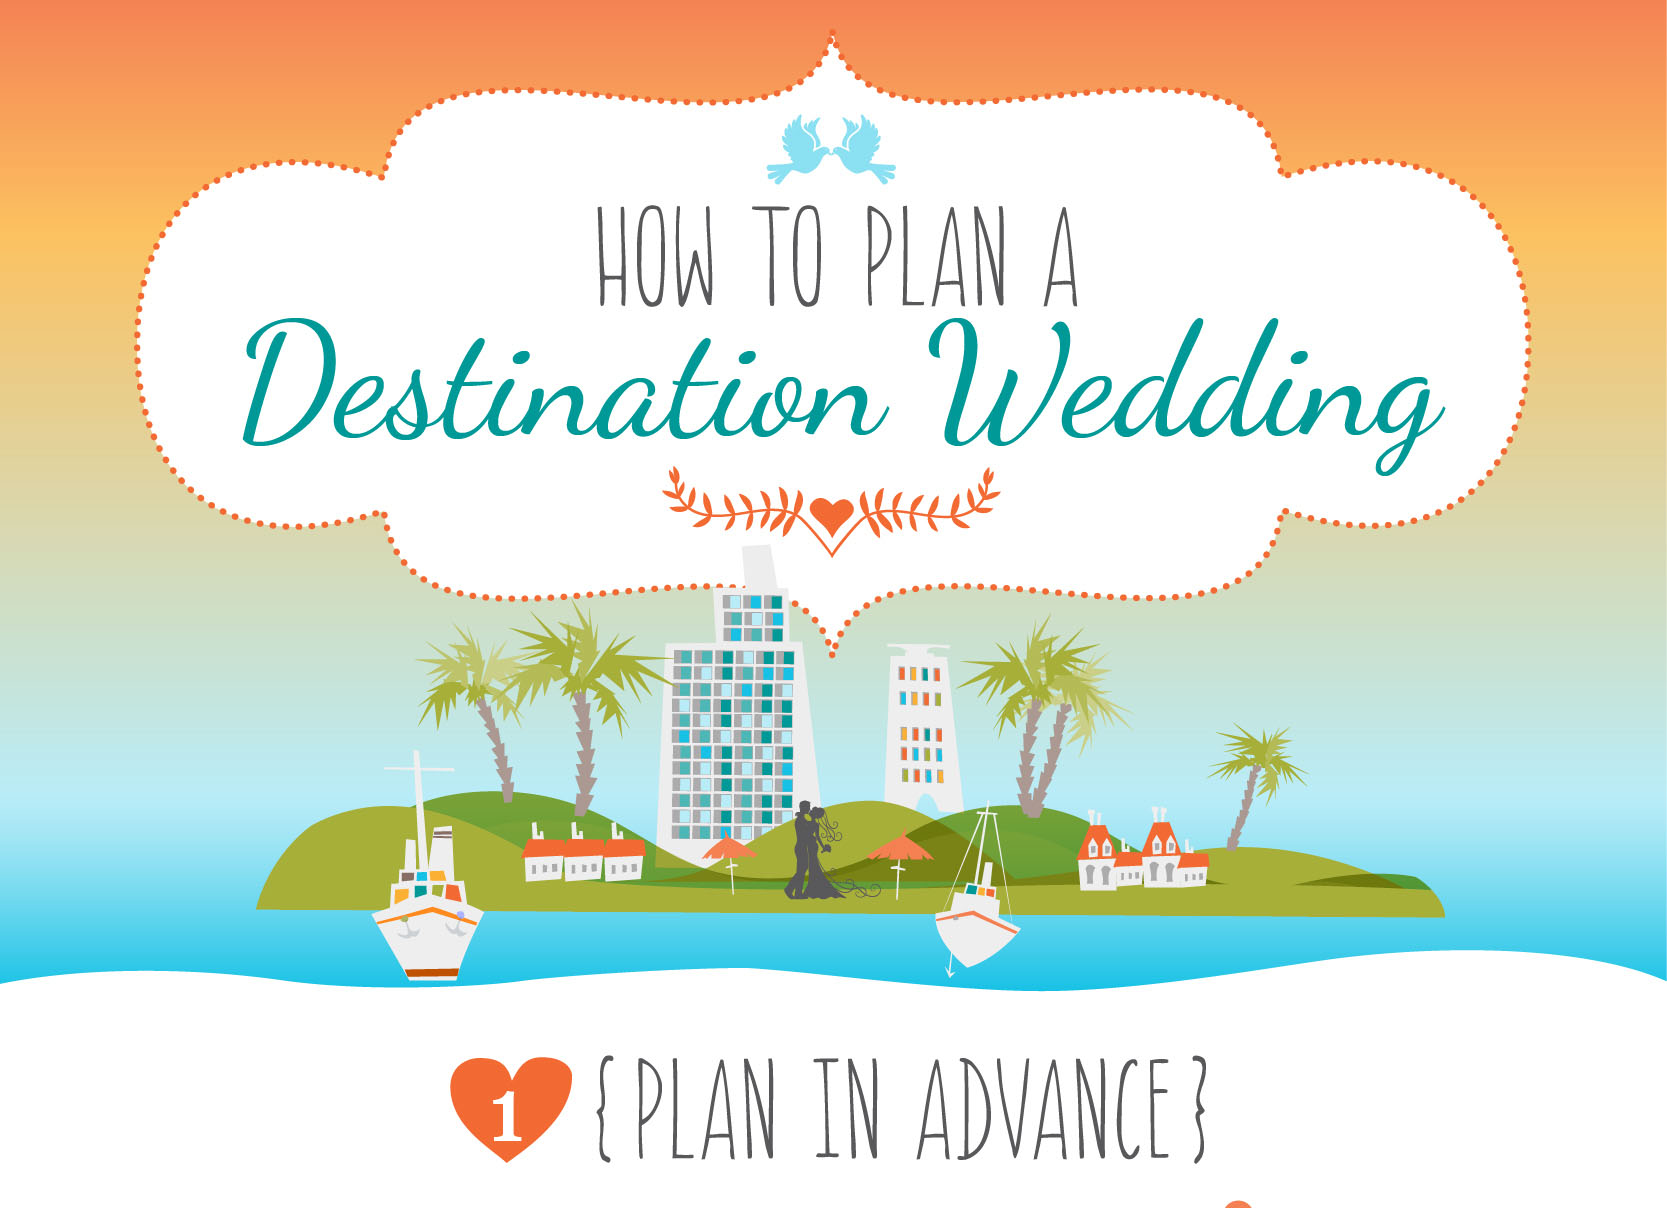 How to Plan a Destination Wedding for Couples Resorts via Internet Marketing Inc client.